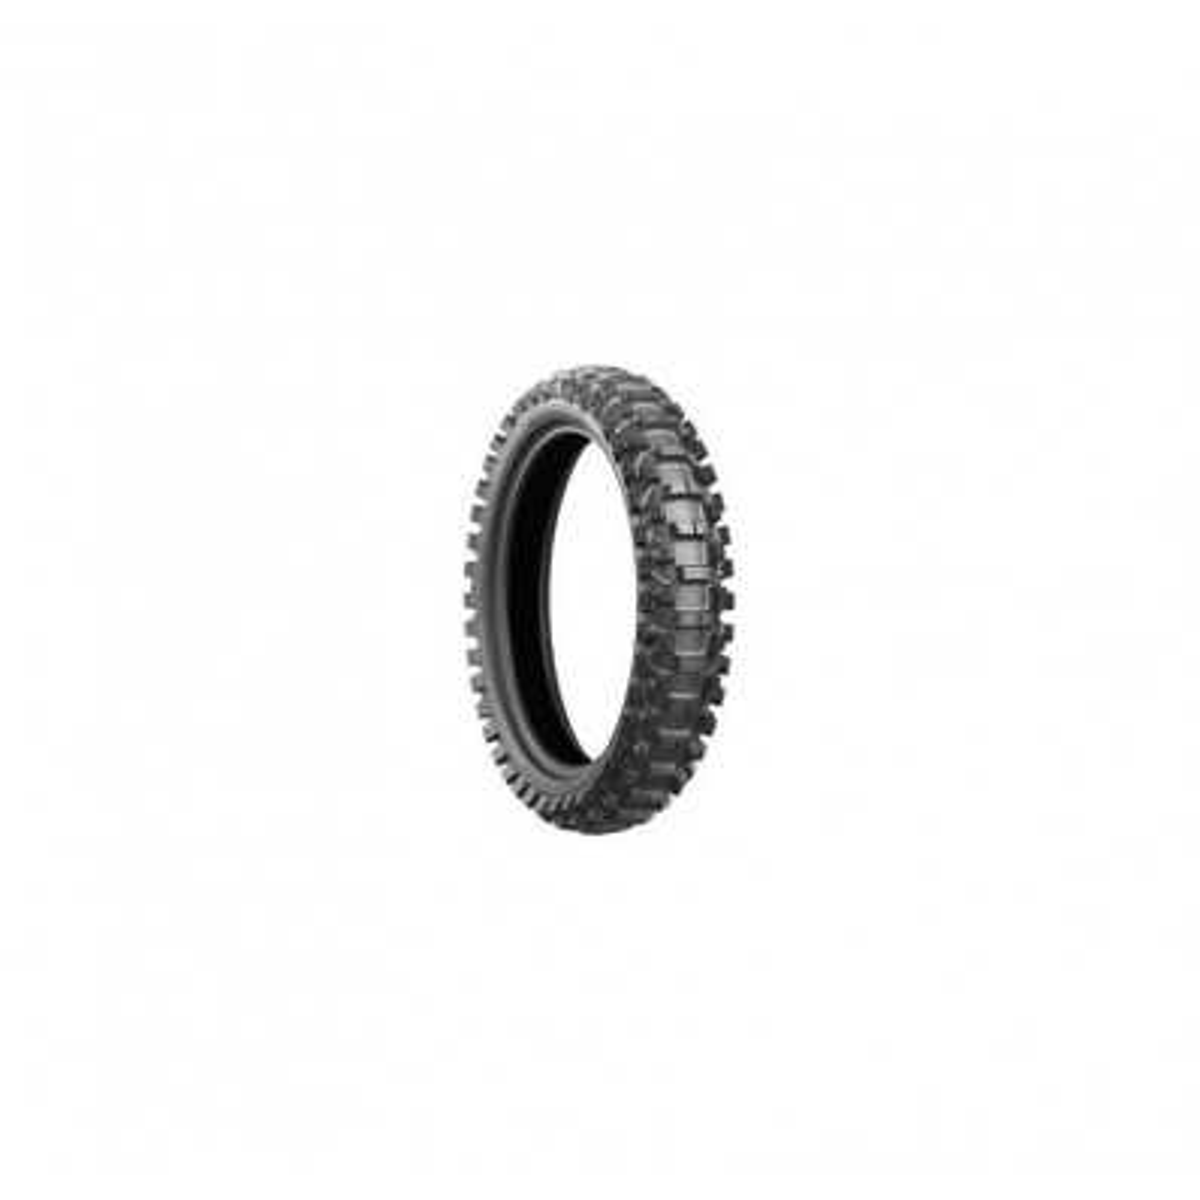 B8010021 - Neumatico Bridgestone 80 100-21